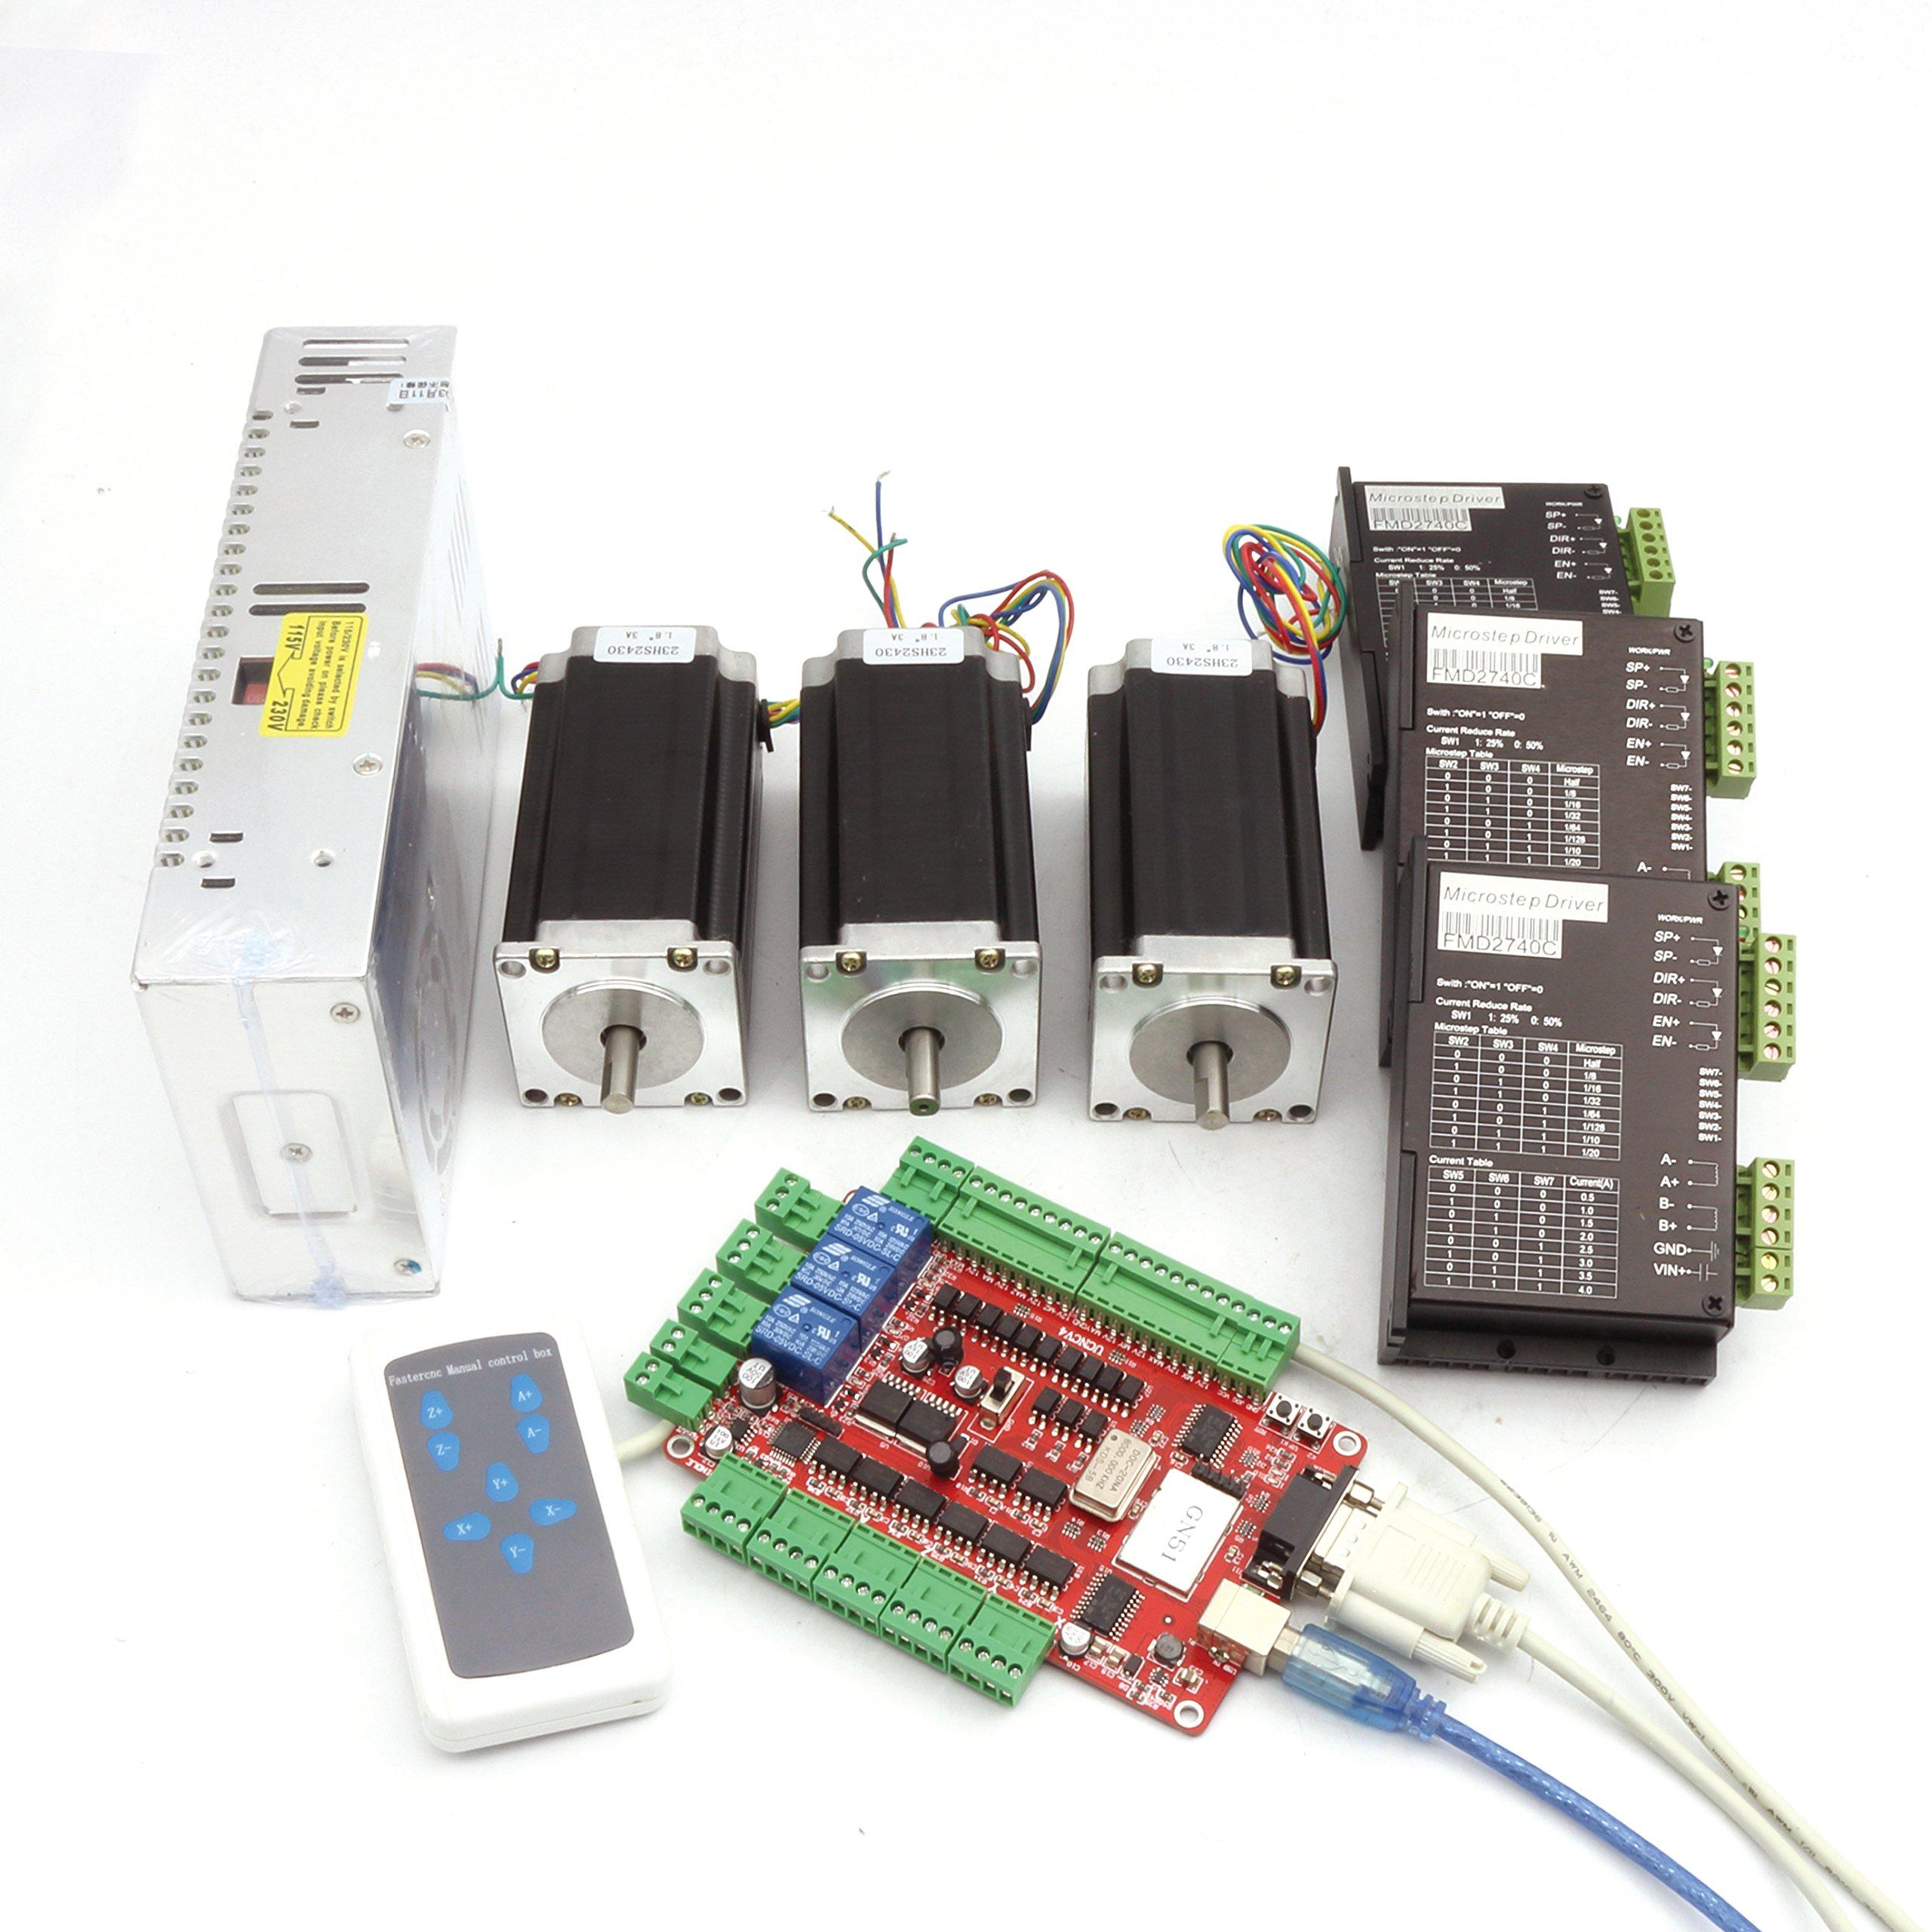 Cnc Wiring Diagrams Shop Wiring Diagram Experts